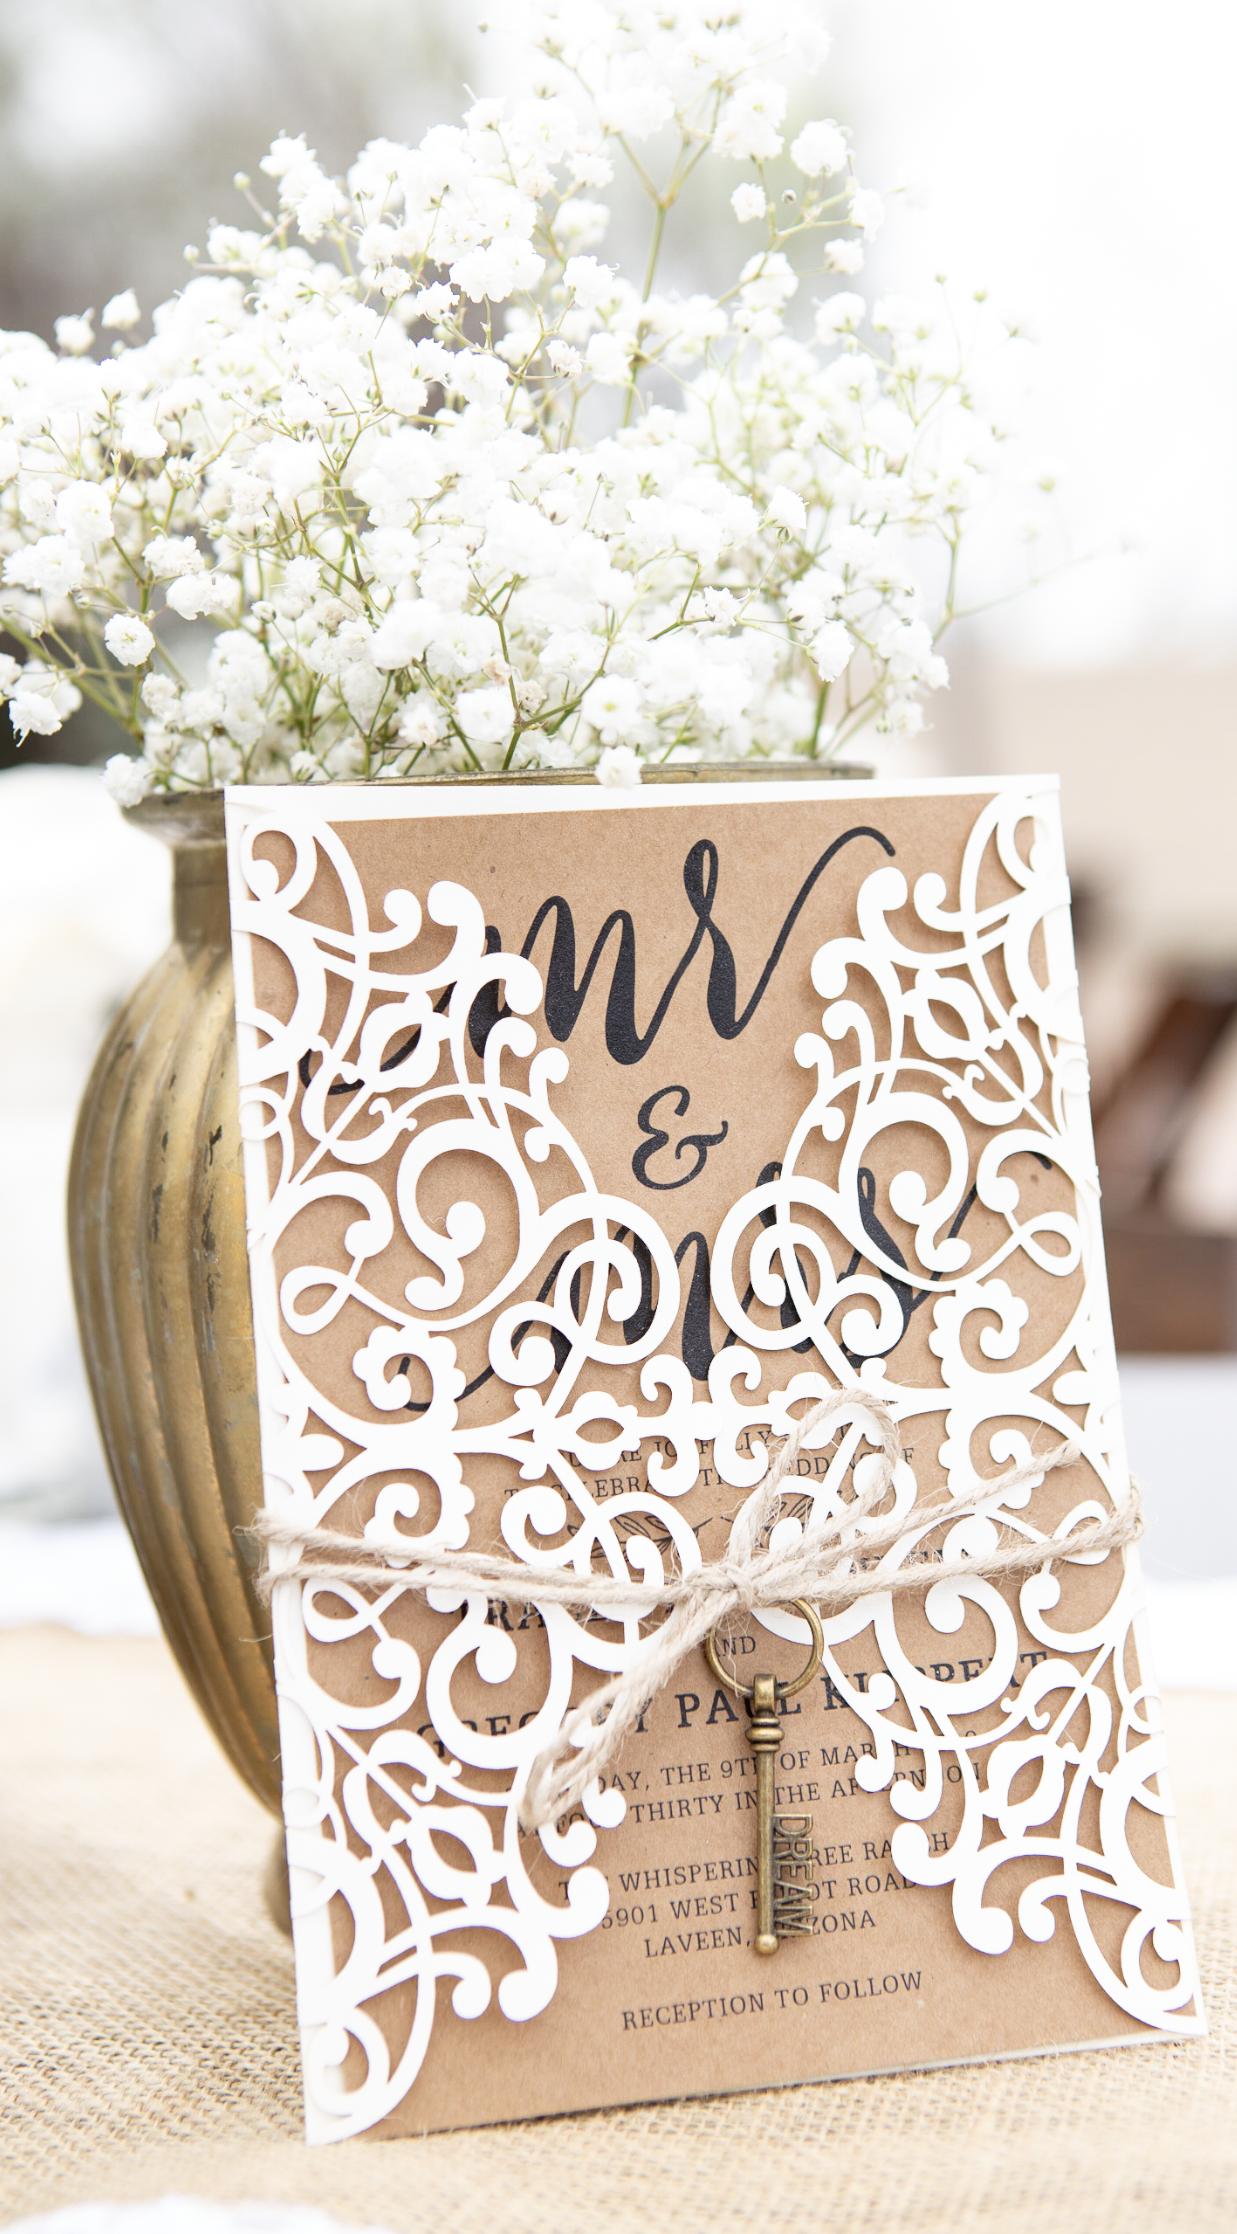 Newest Wedding Invitation Ideas Trends And Designs Phoenix Wedding Photographers David Orr Photography In 2020 Wedding Invitation Trends Fun Wedding Invitations Embossed Invitations